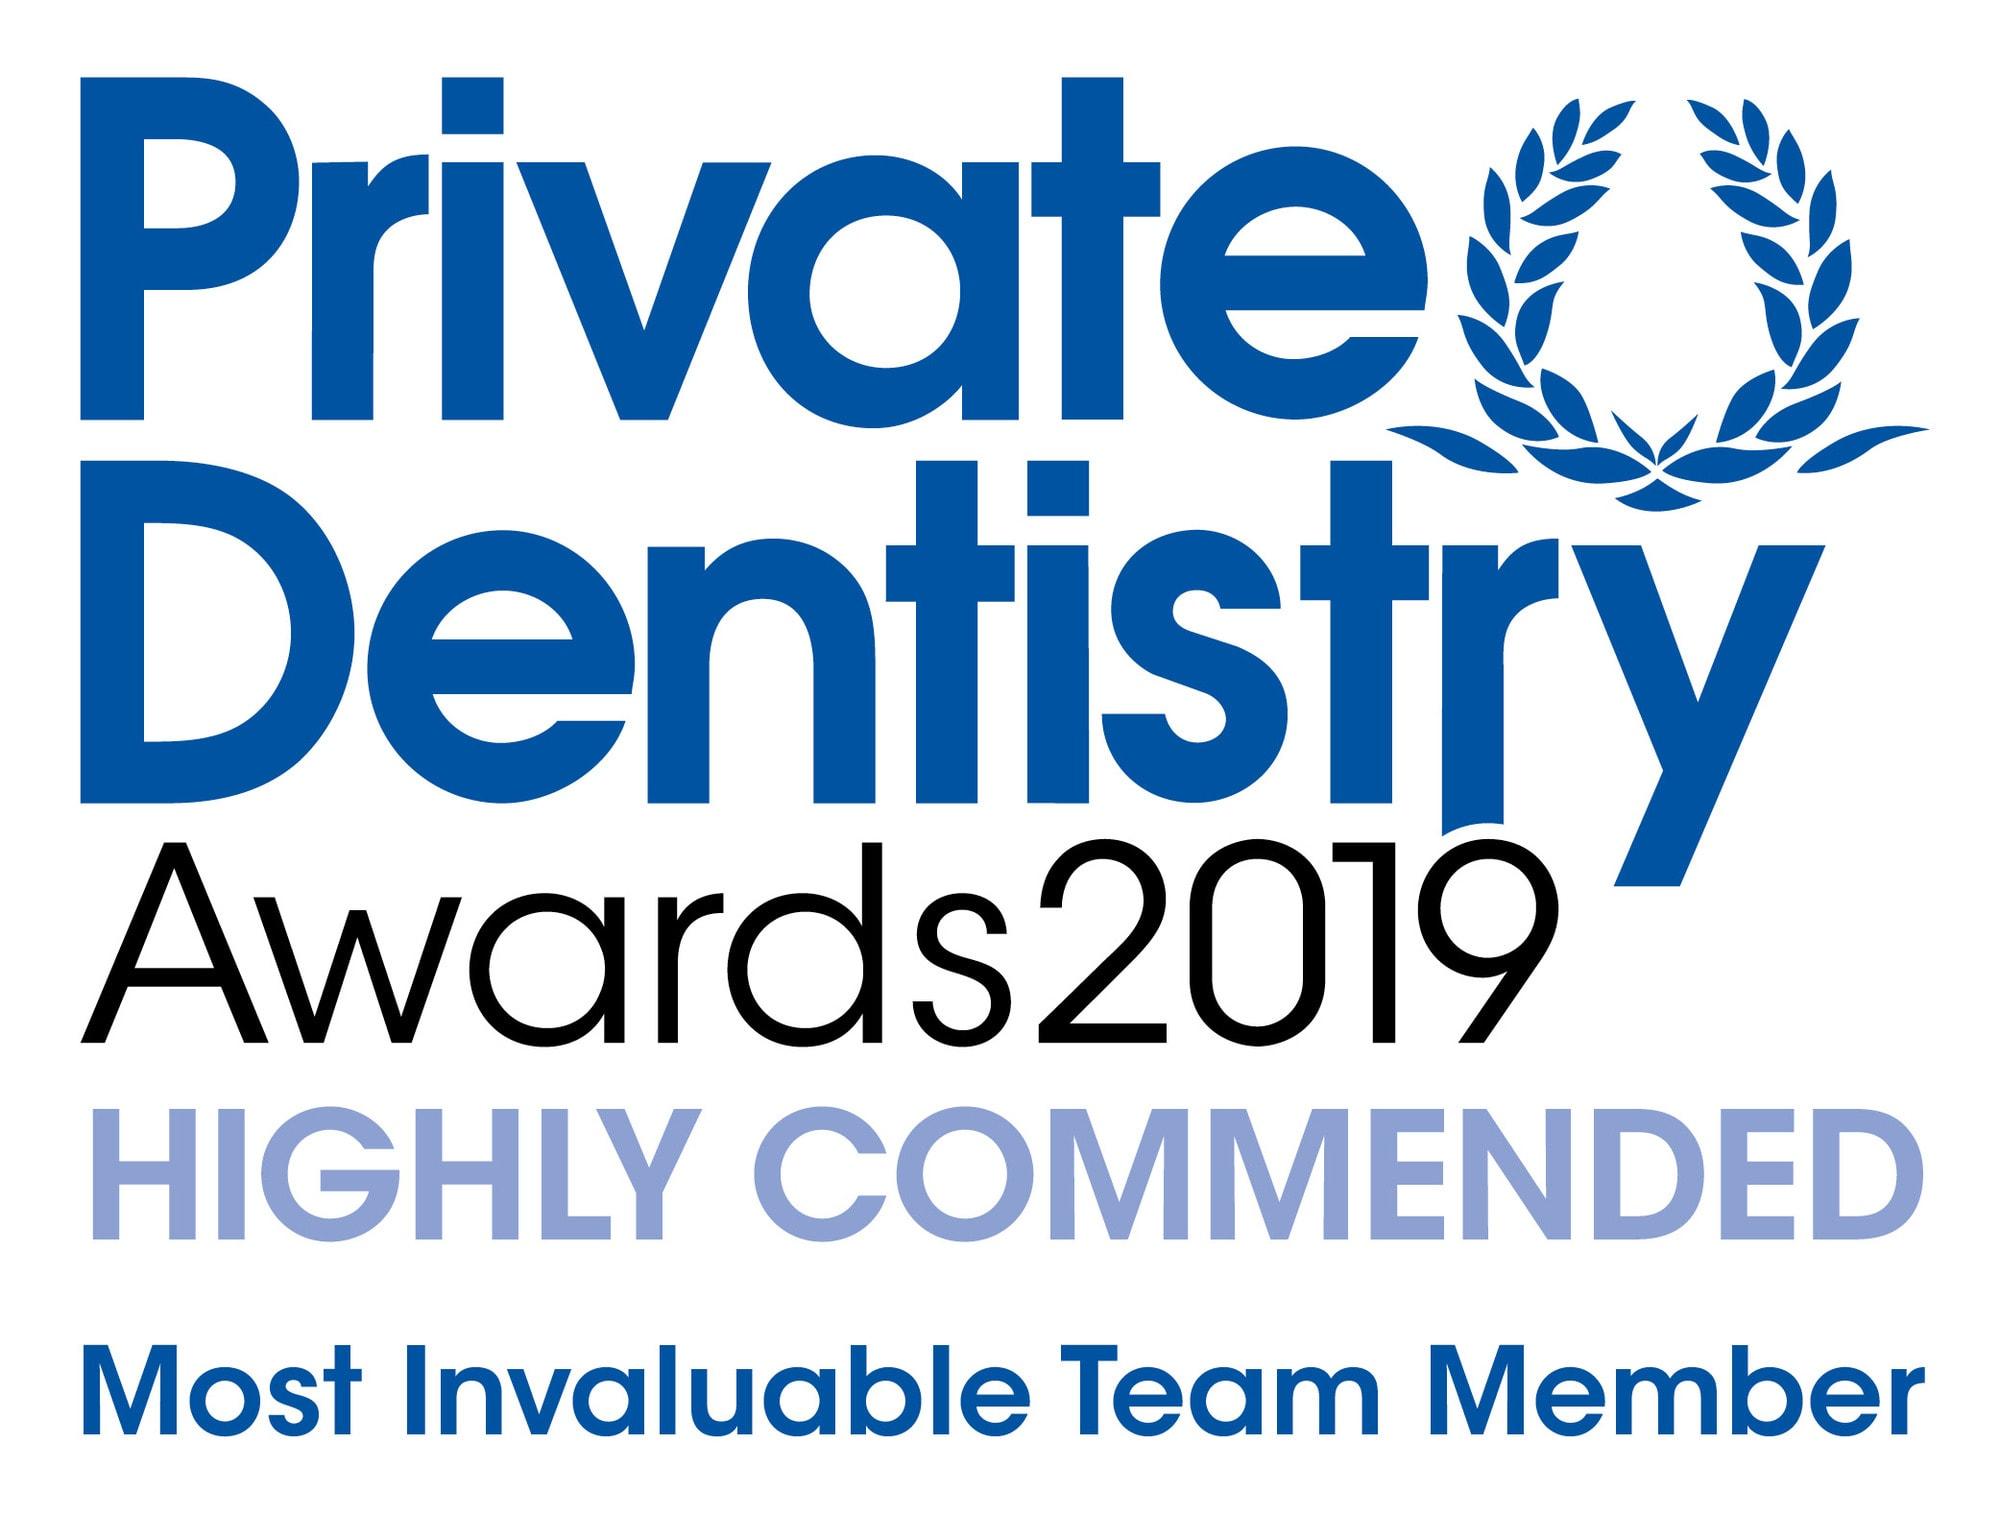 Private Dentistry Awards 2019 Highly Commended Best Team Member